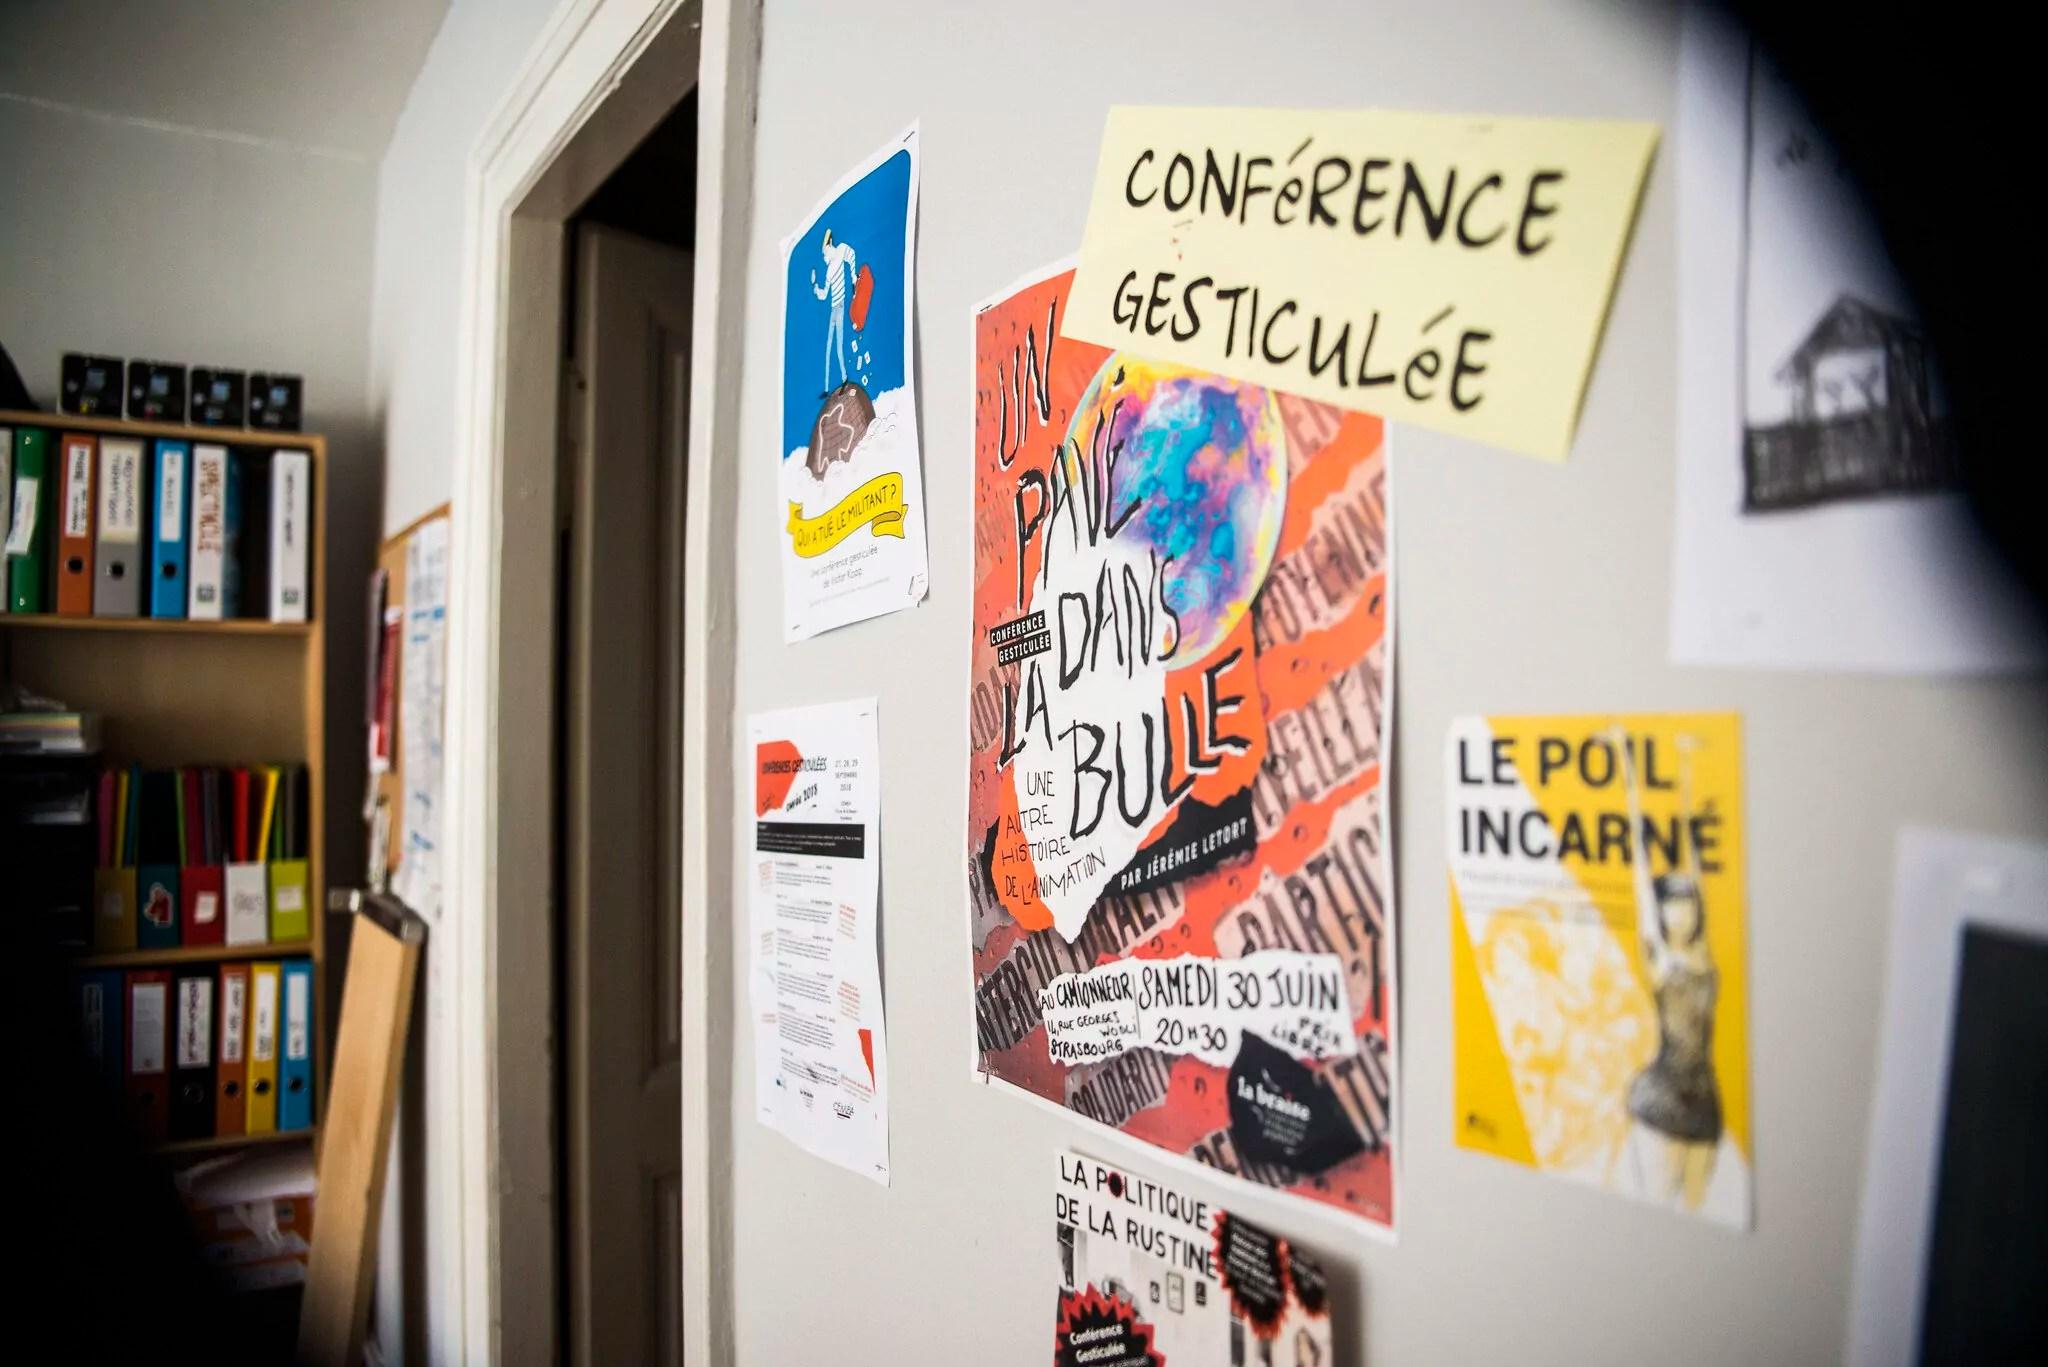 Cooperative education populaire la braise strasbourg @ Martin Lelievre 2021 Rue89 Strasbourg (2)